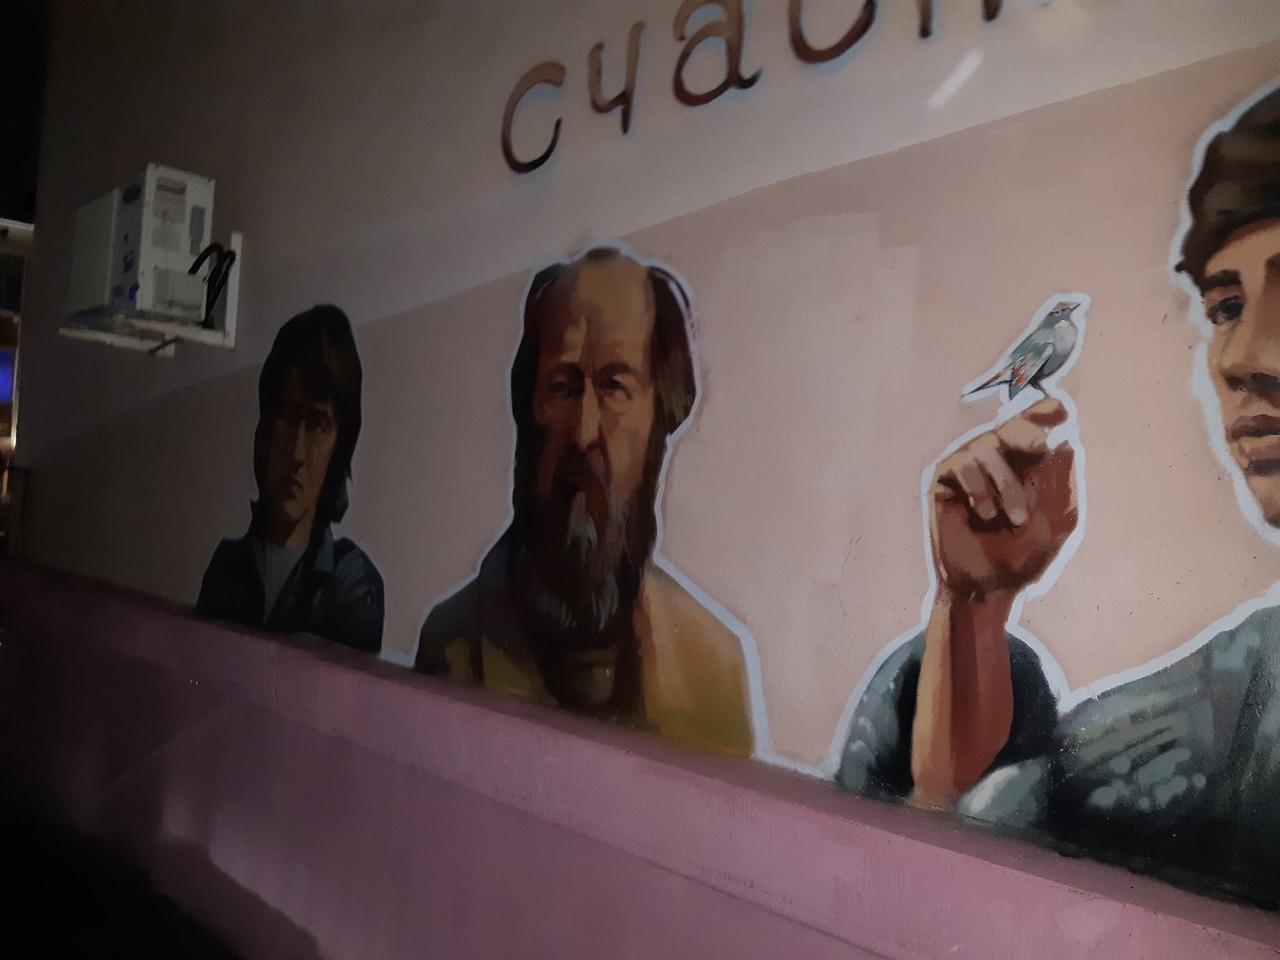 20210108_18-54-Граффити на Ленина восстановили-pic4